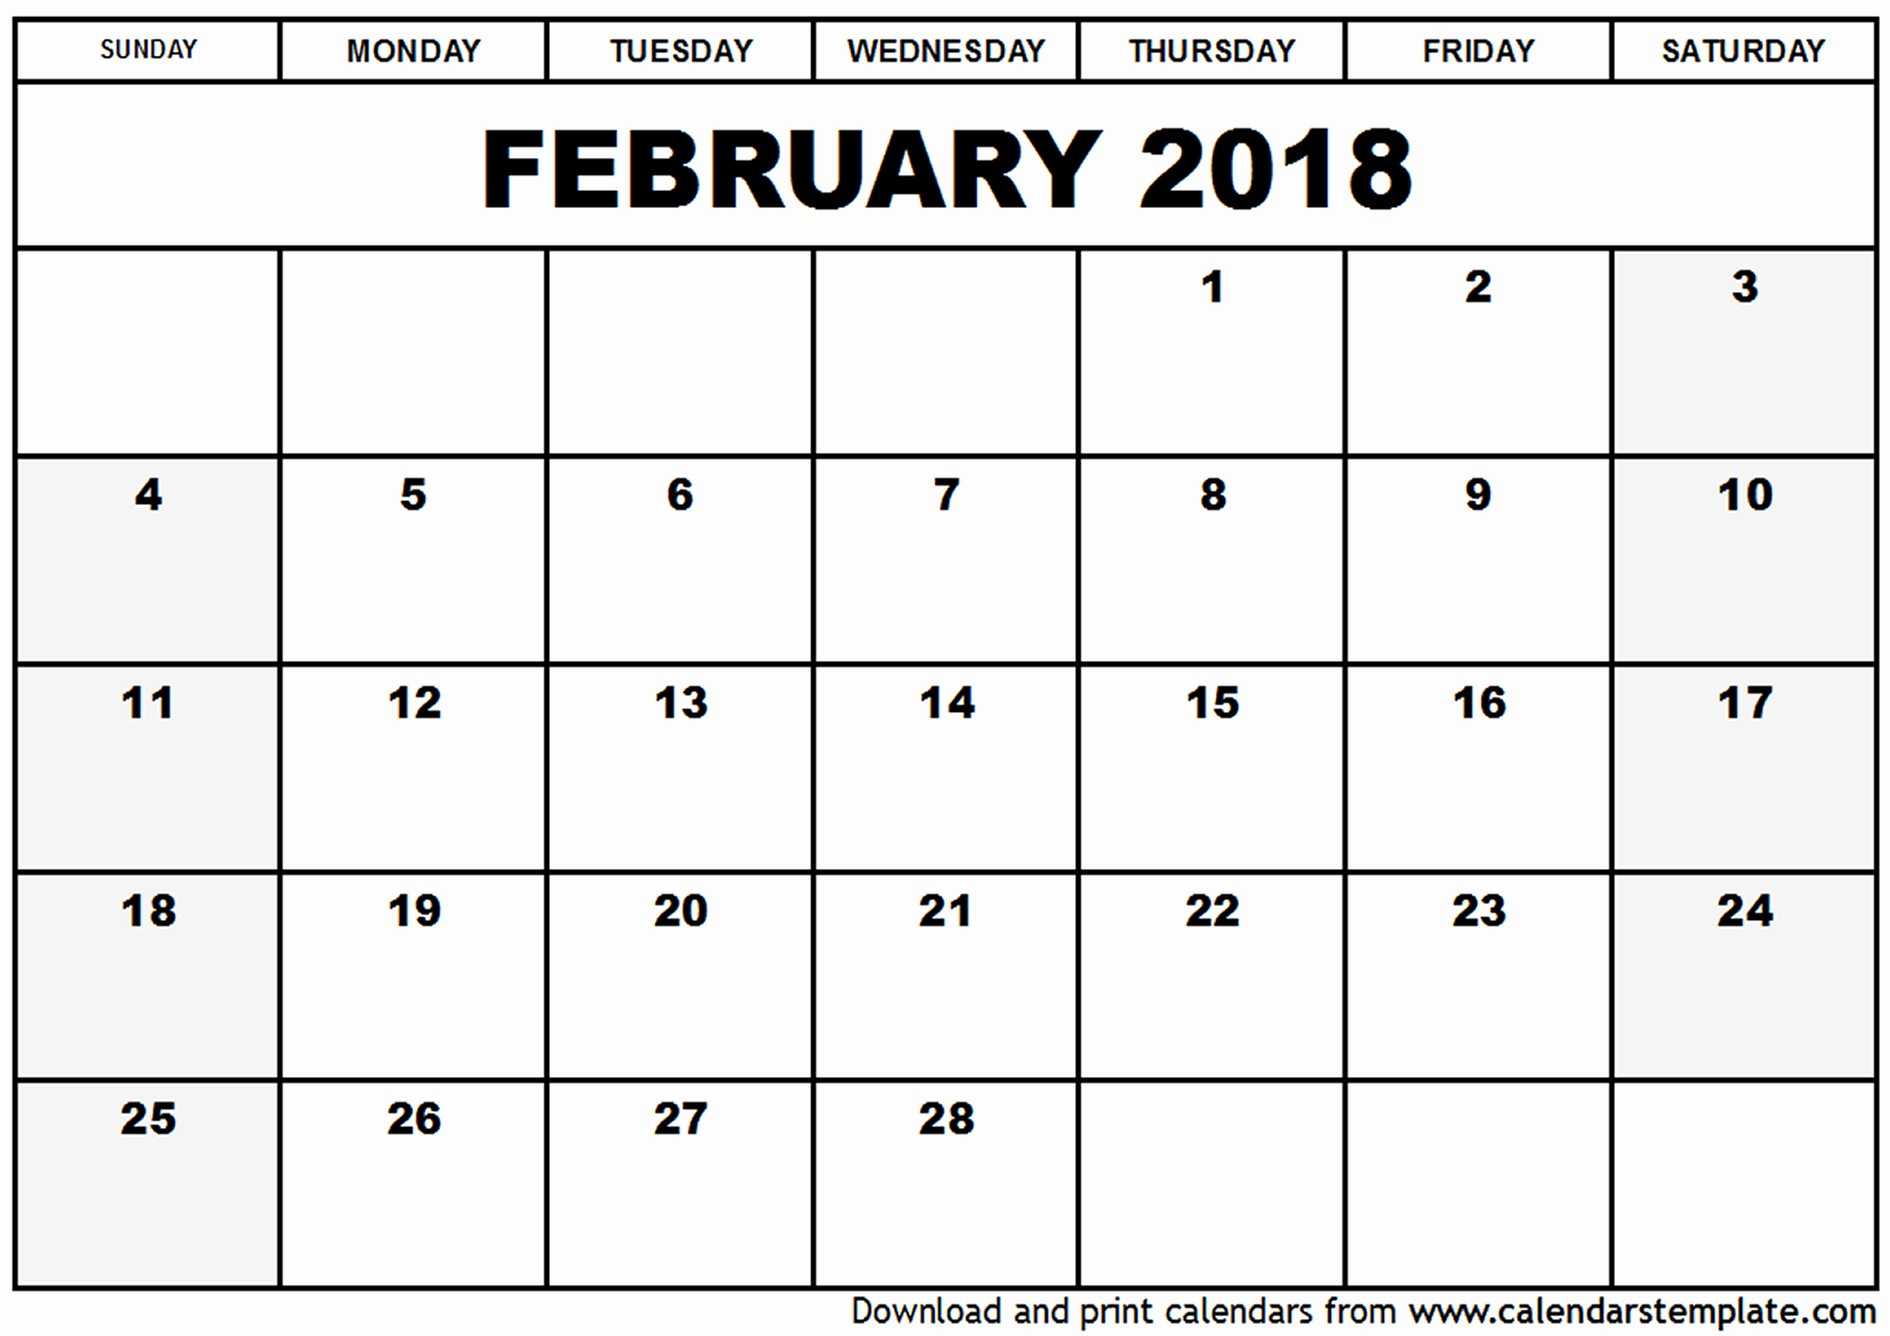 2017-2018 Printable Calendar New February 2018 Calendar